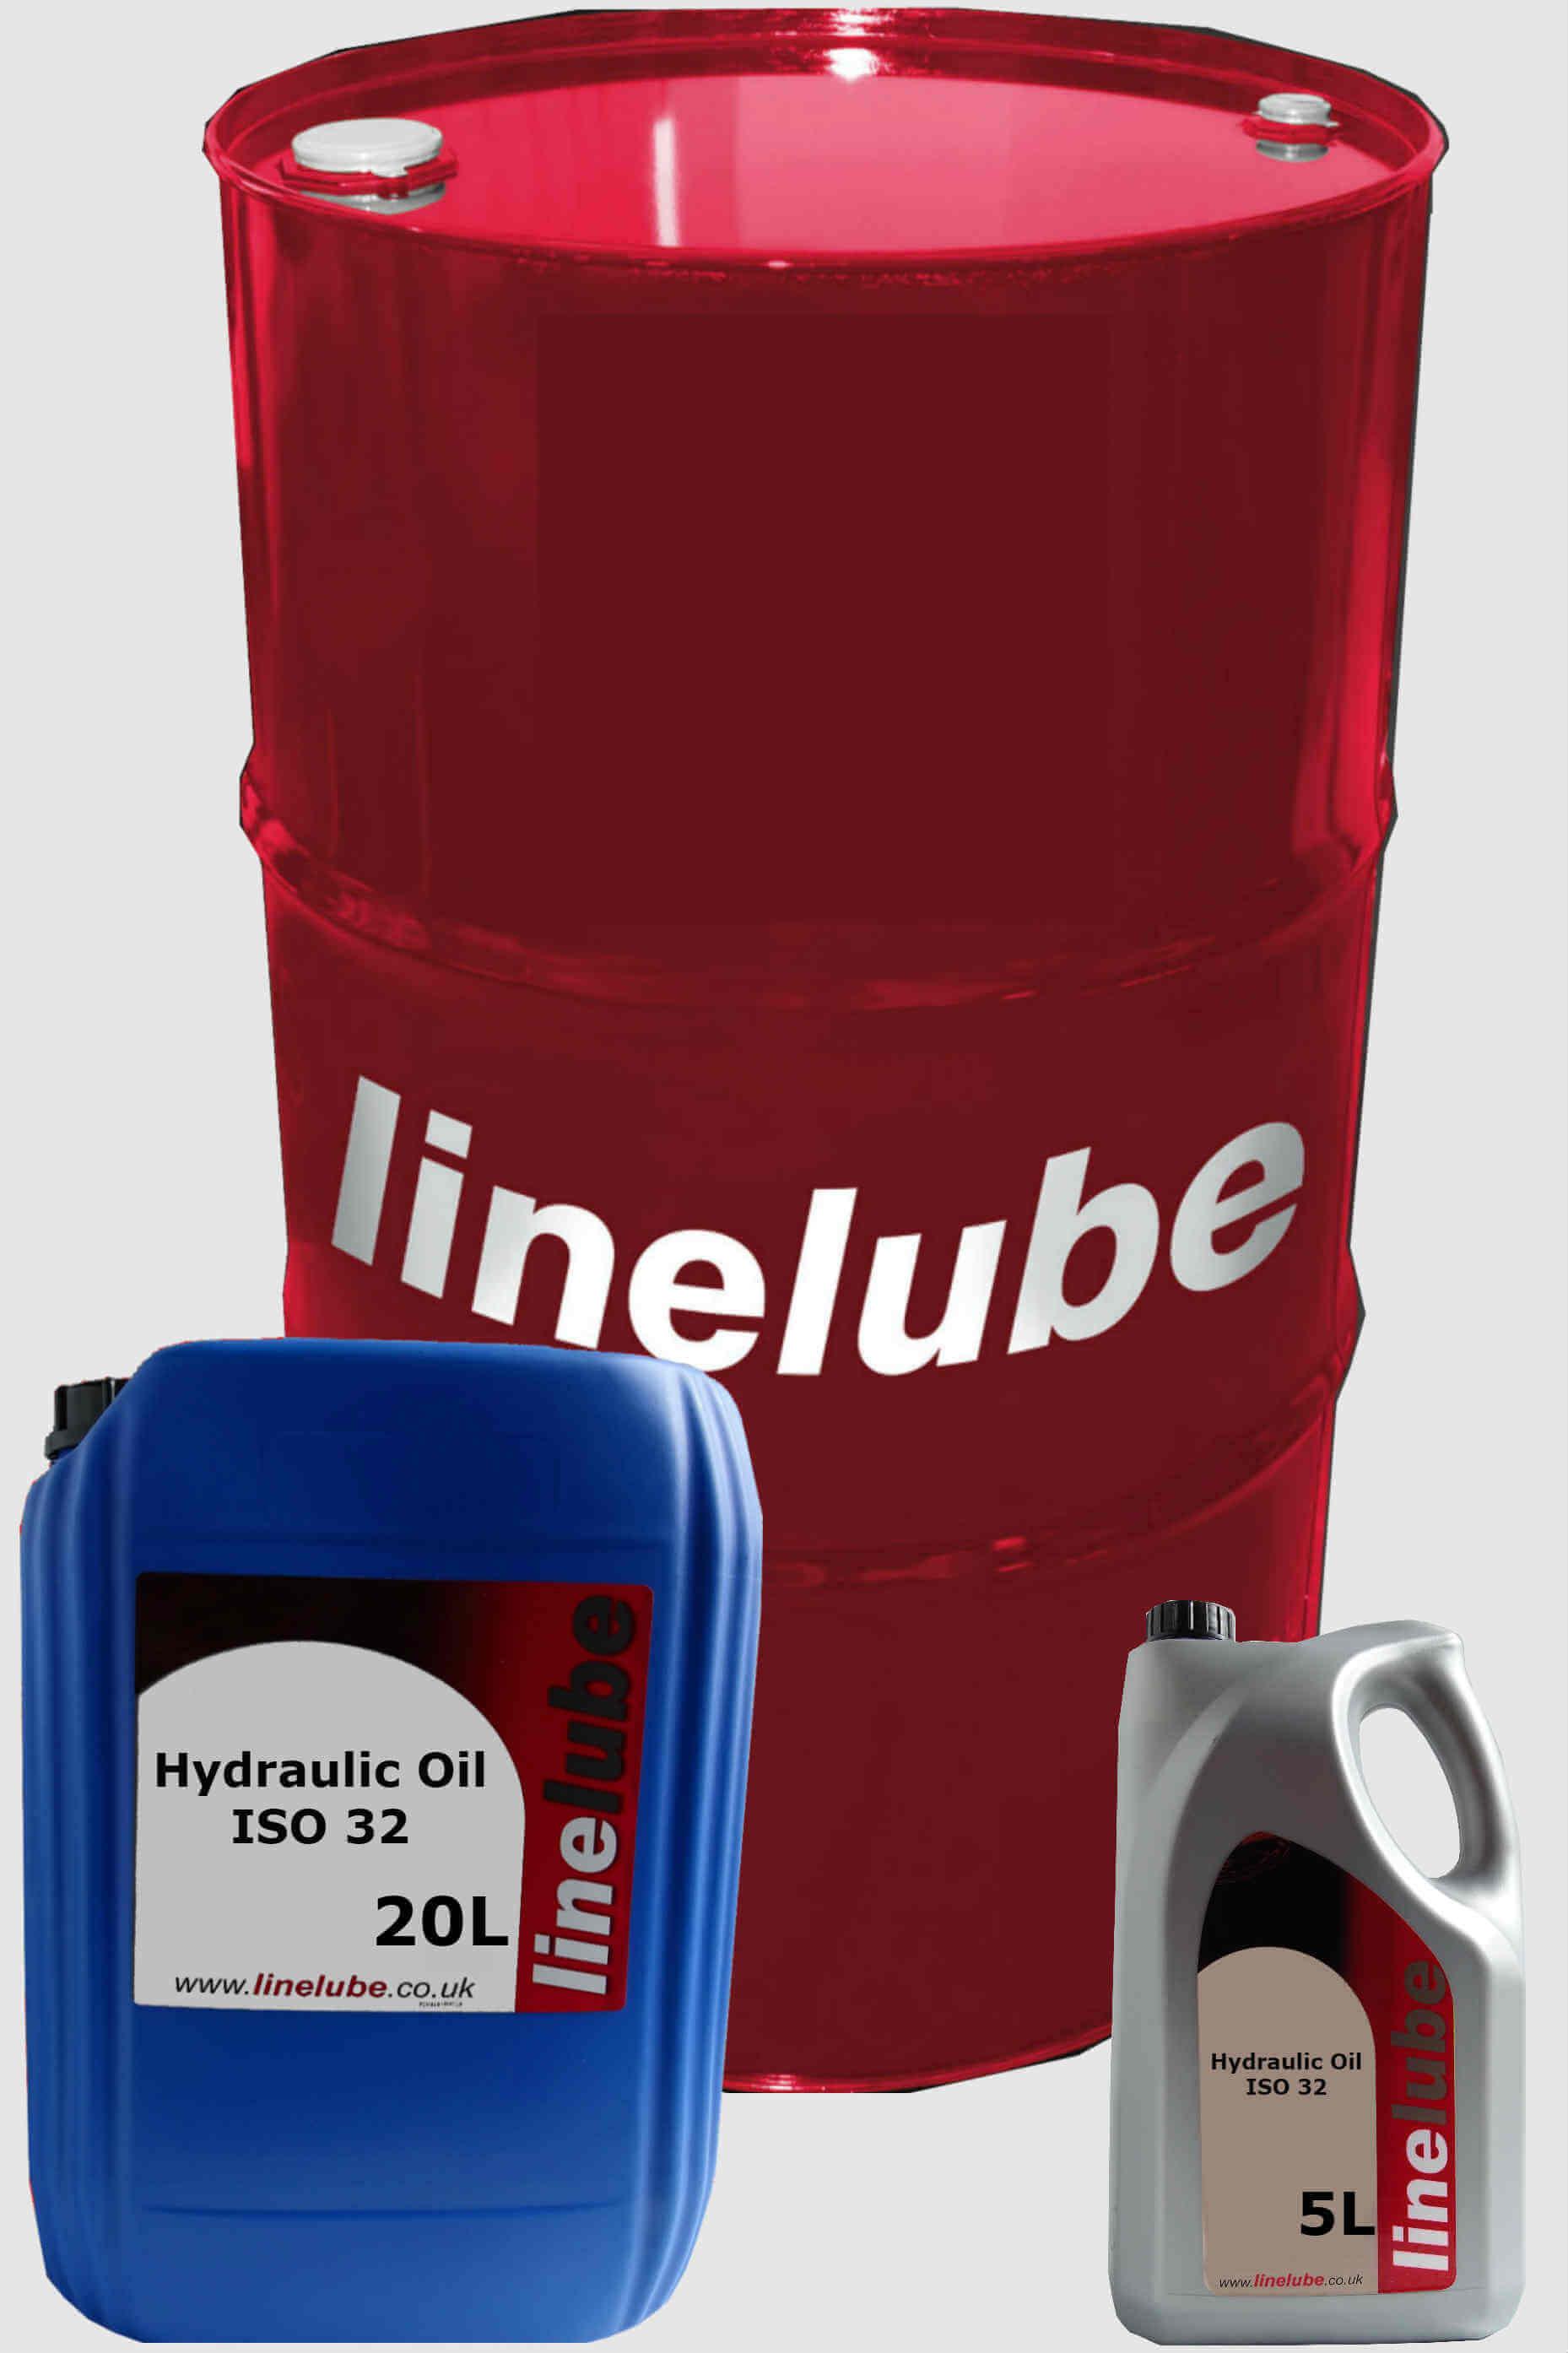 Linelube Hydraulic Oil ISO 32 | Online Lubricants | Fast